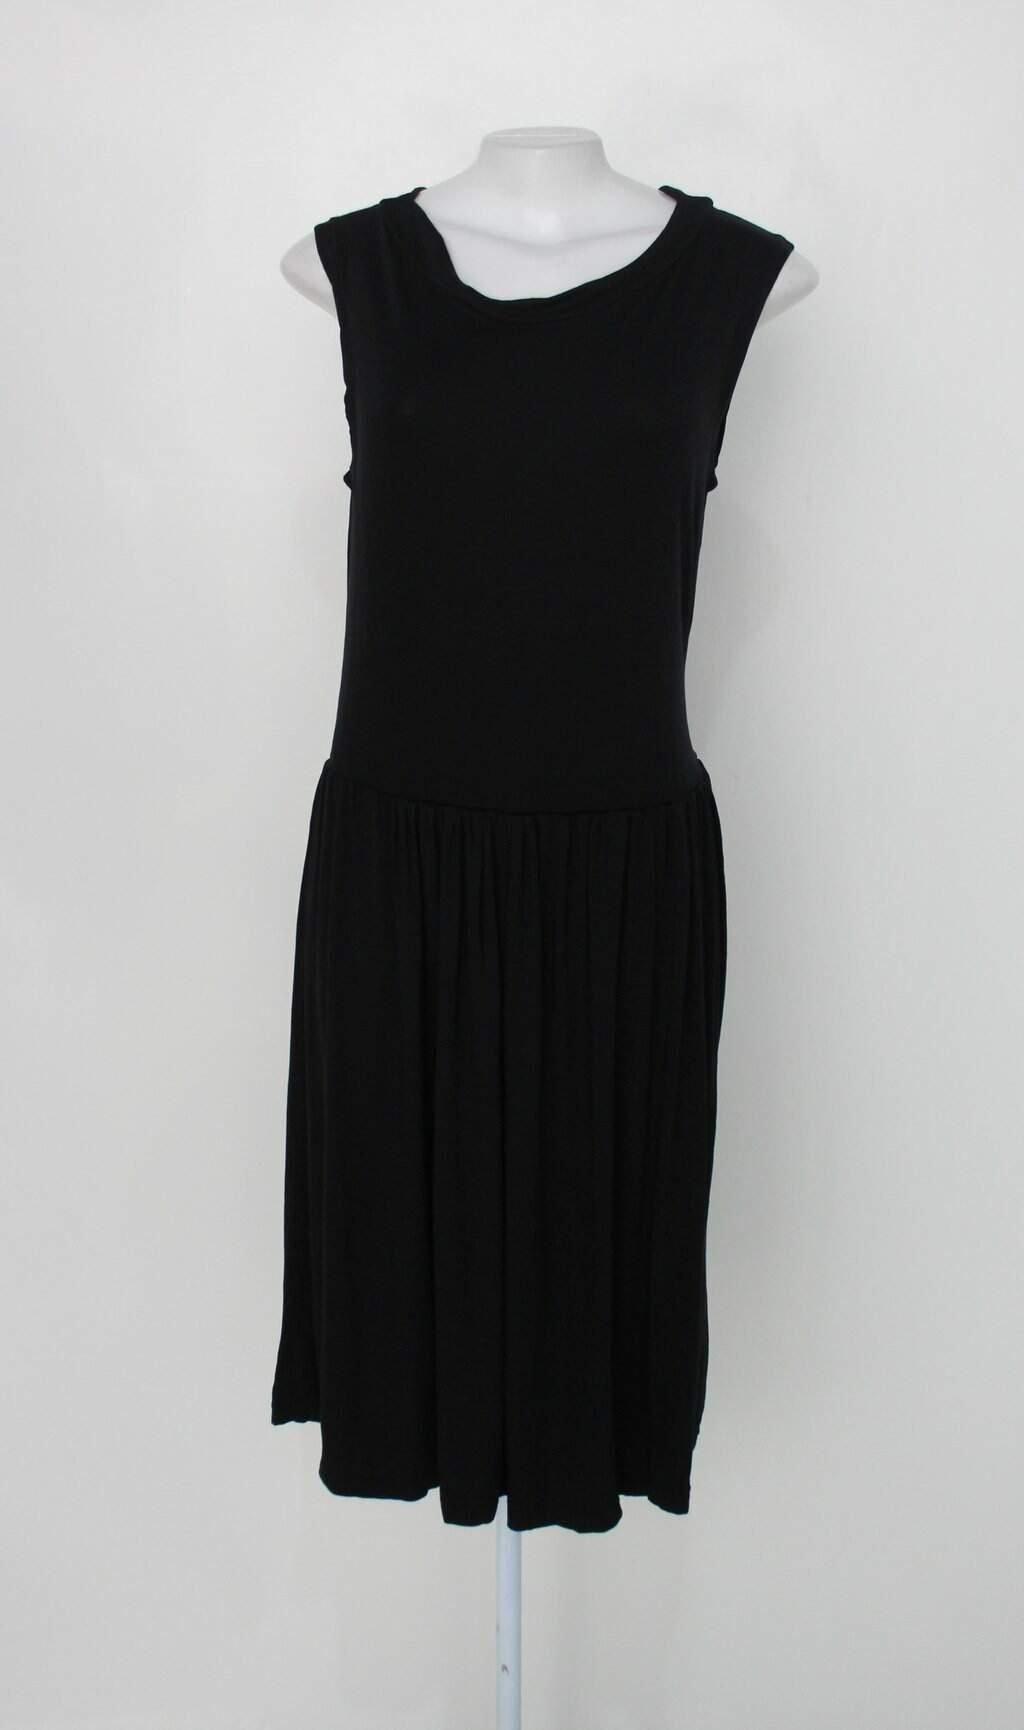 Vestido Feminino Preto